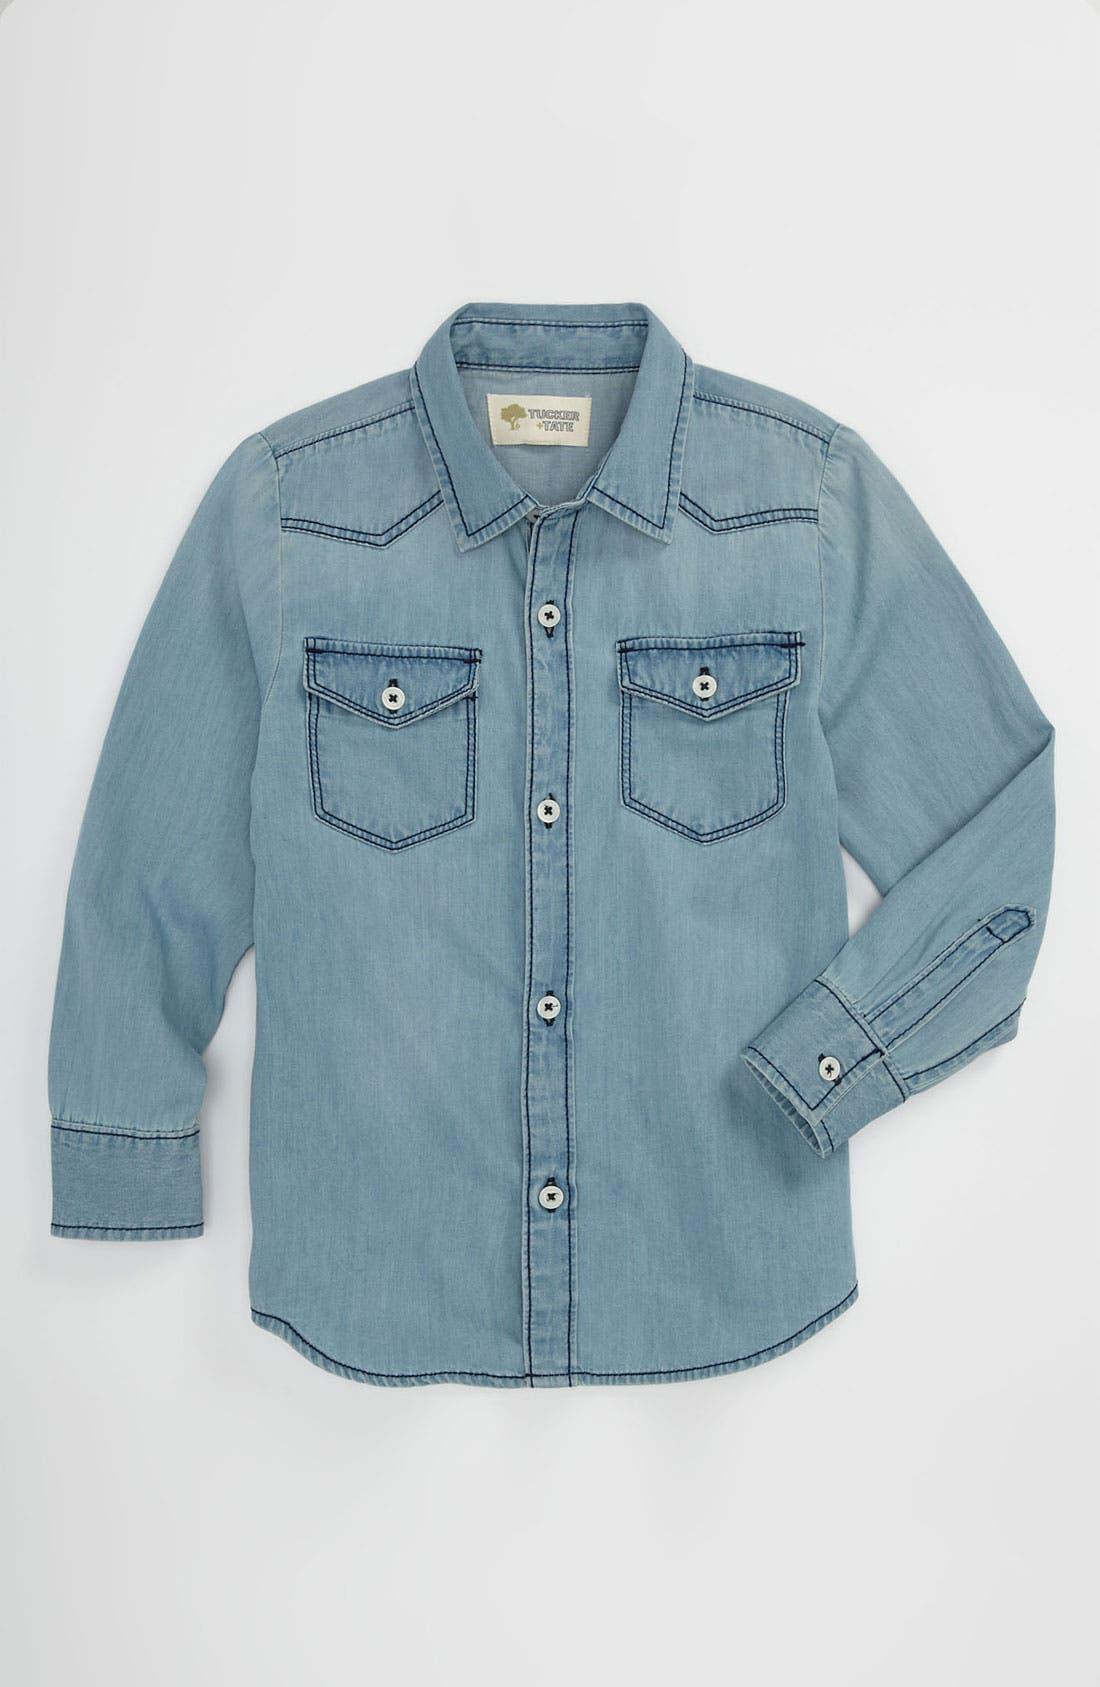 Alternate Image 1 Selected - Tucker + Tate 'Benson' Denim Shirt (Big Boys)